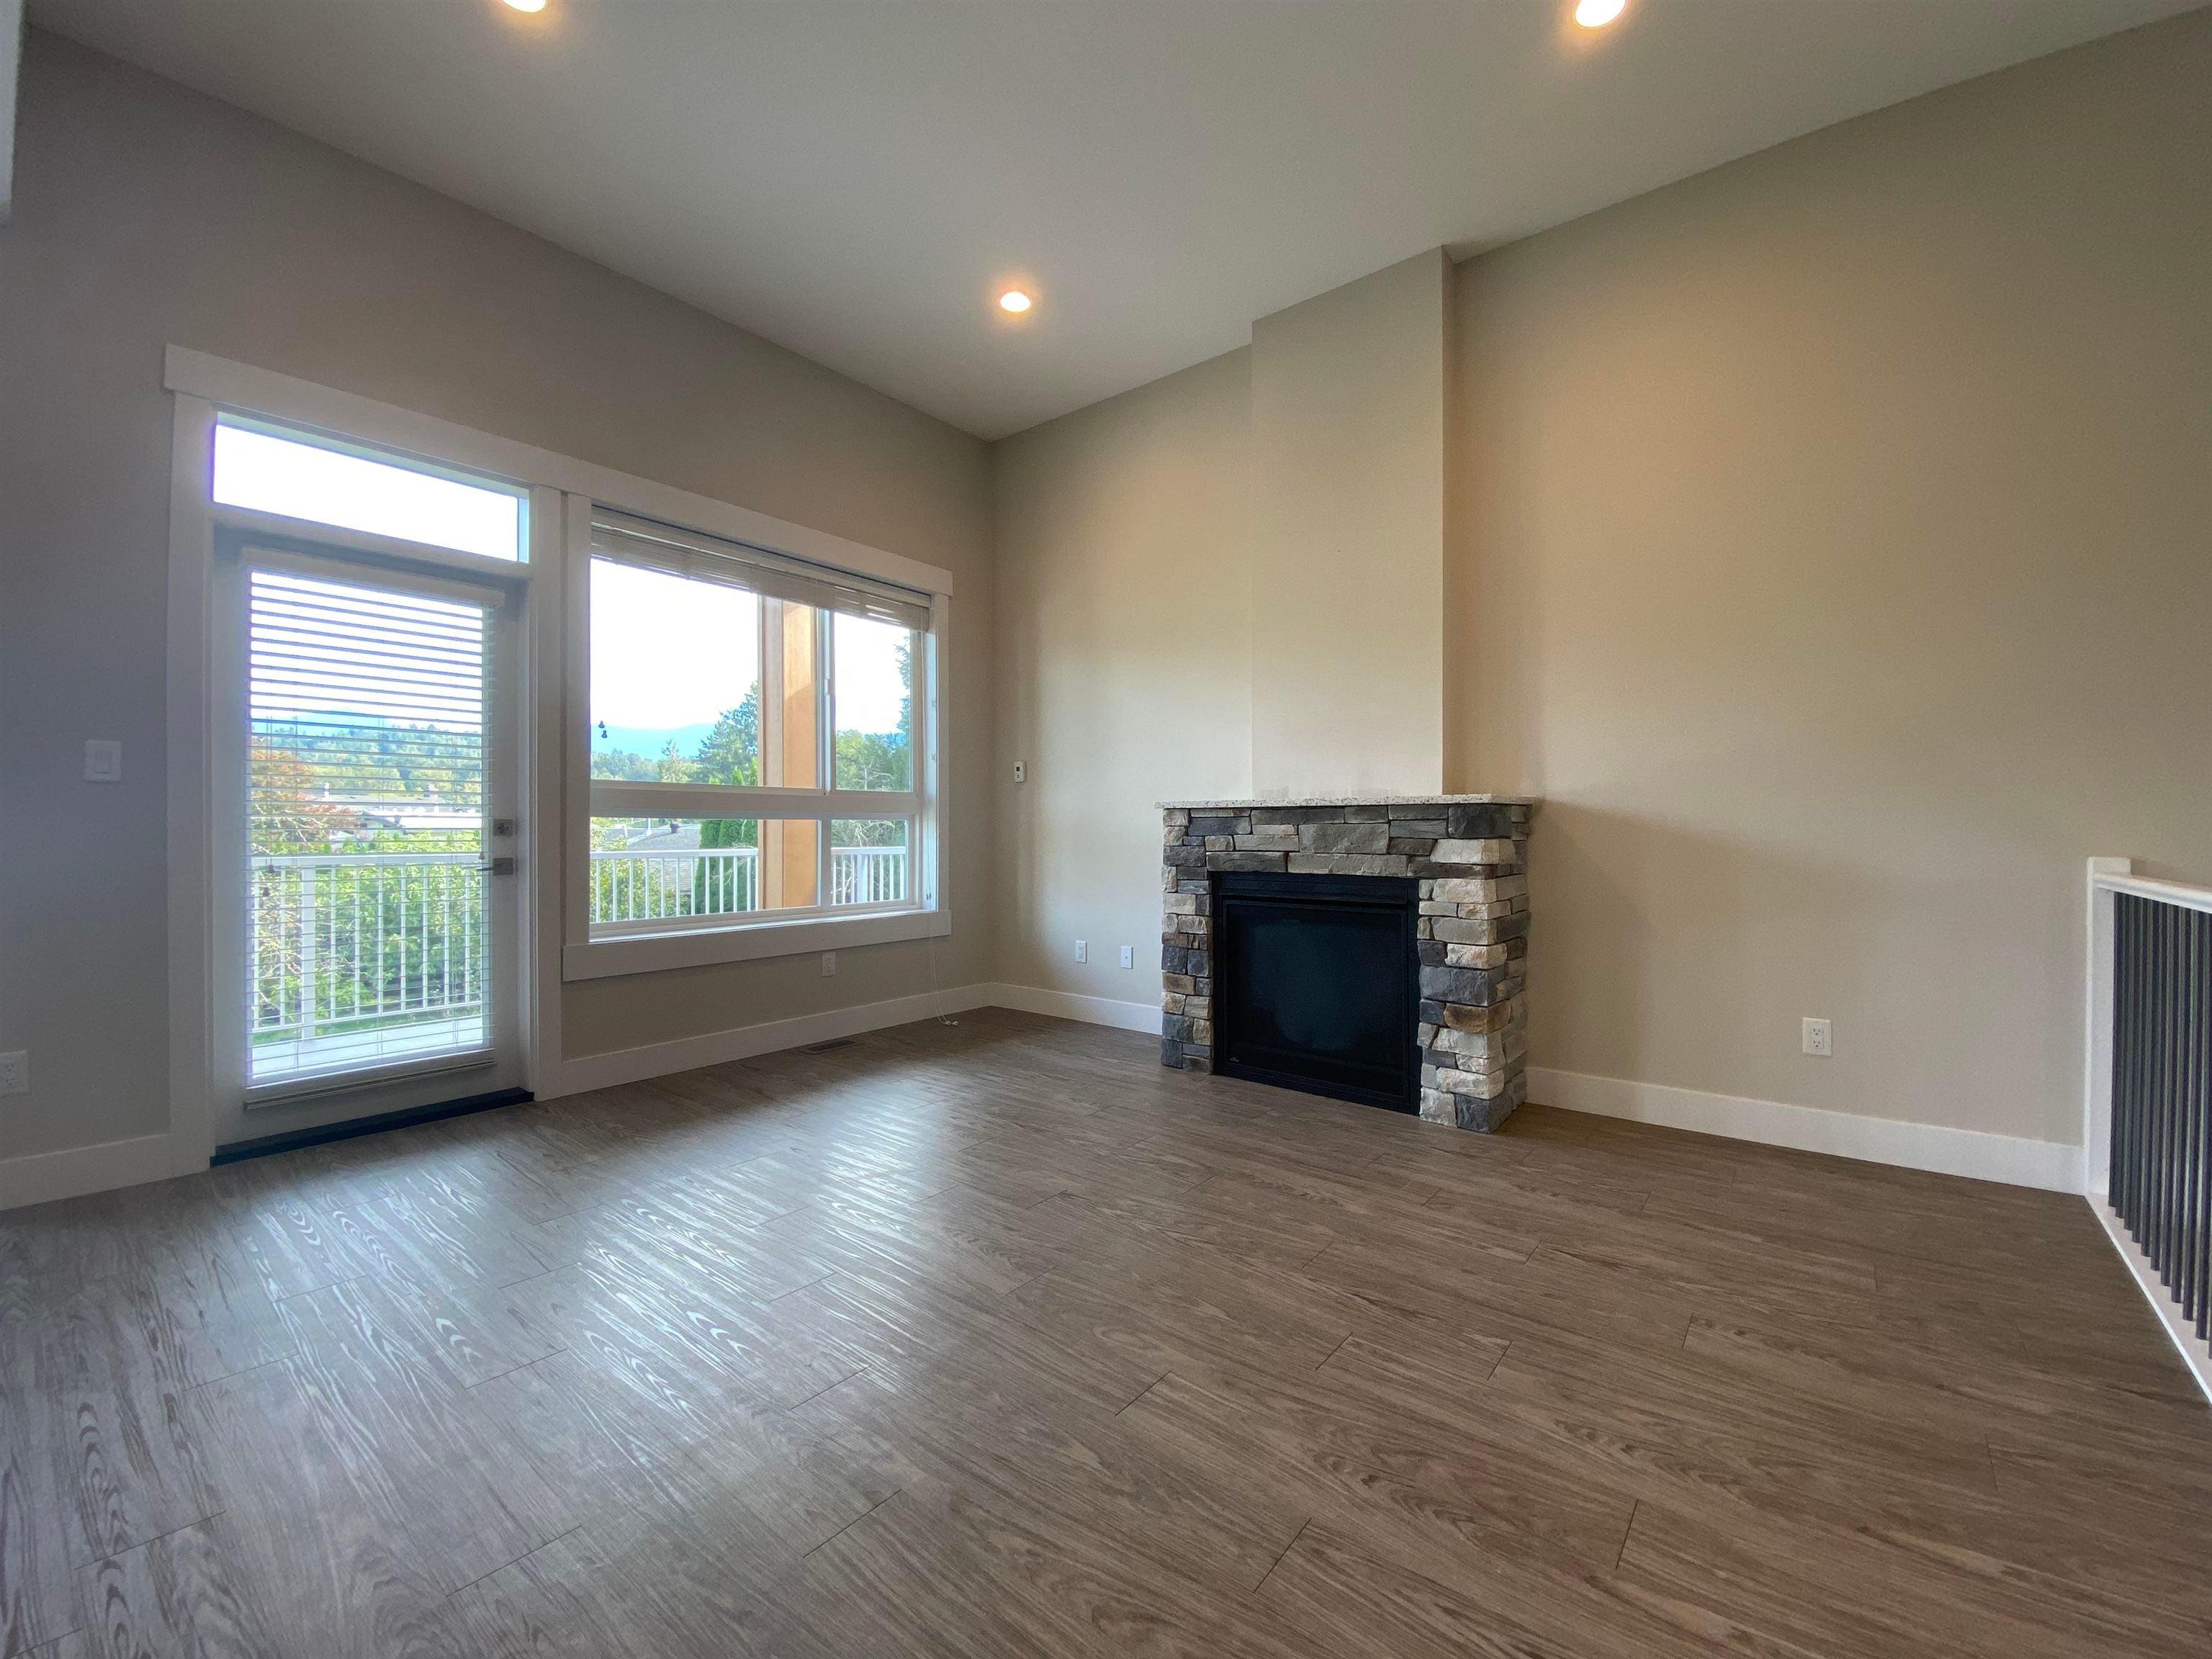 10144 KILLARNEY DRIVE - Fairfield Island House/Single Family for sale, 5 Bedrooms (R2625716) - #15